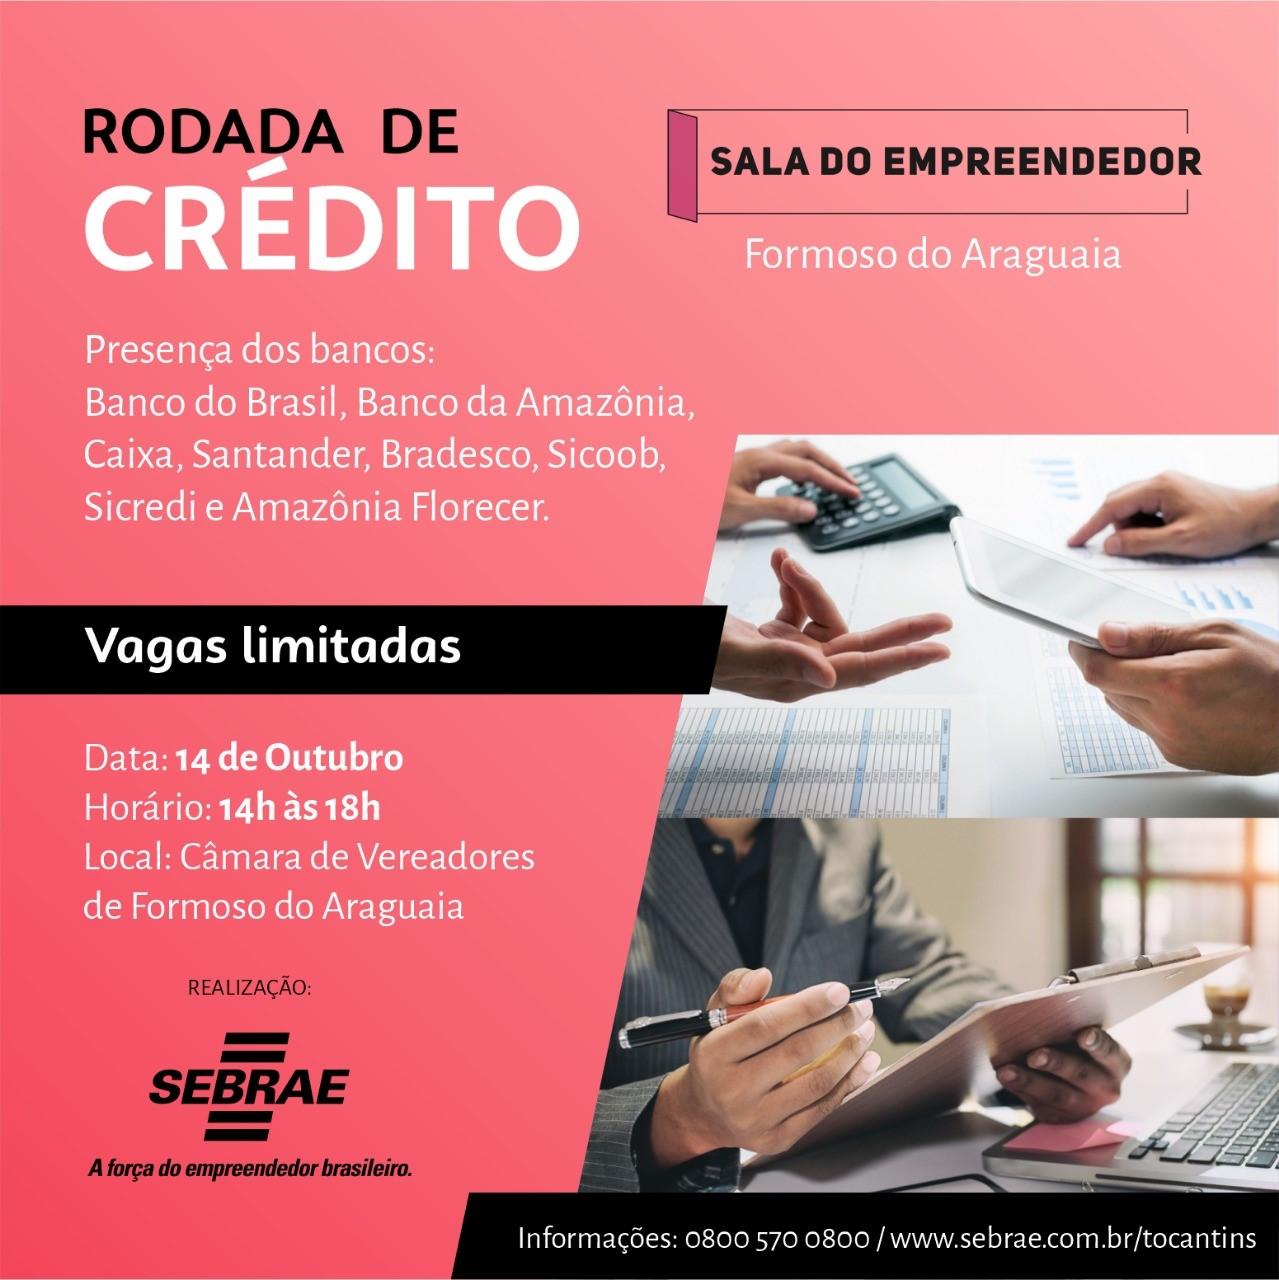 Formoso do Araguaia recebe Rodada de Crédito do Sebrae nesta quinta, 14